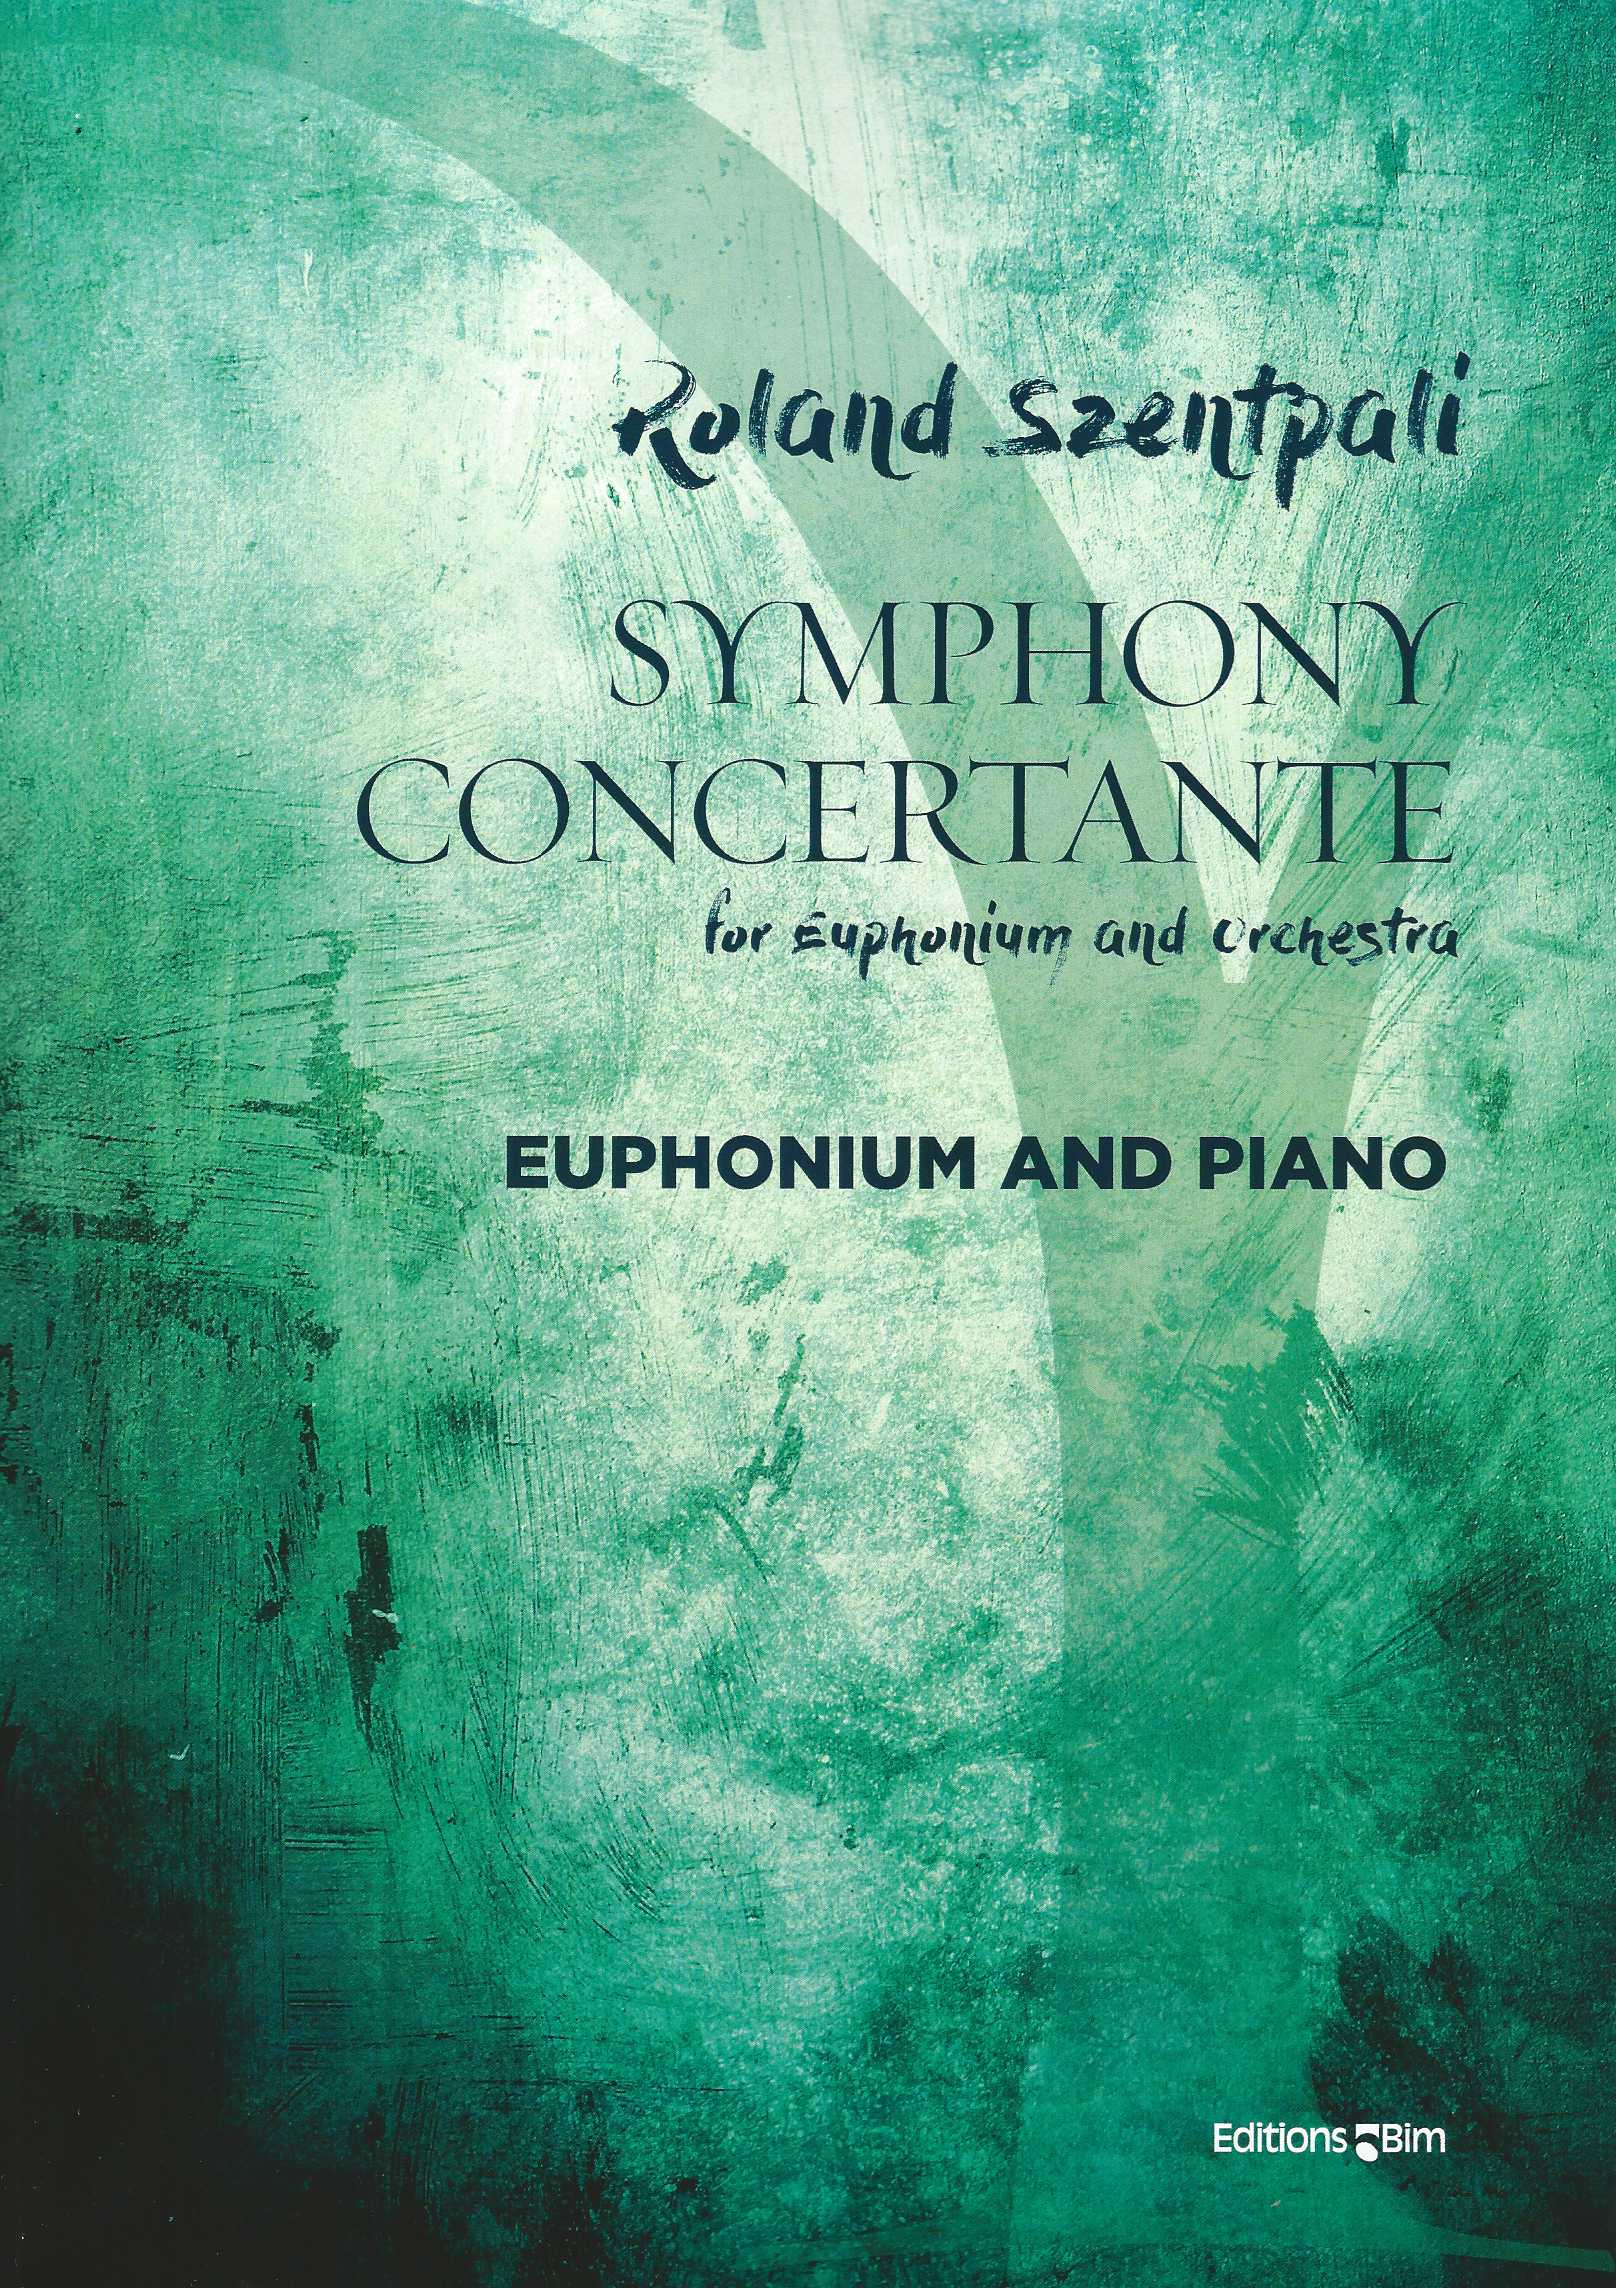 Symphony Concertante - Roland Szentpali - Euphonium and Piano